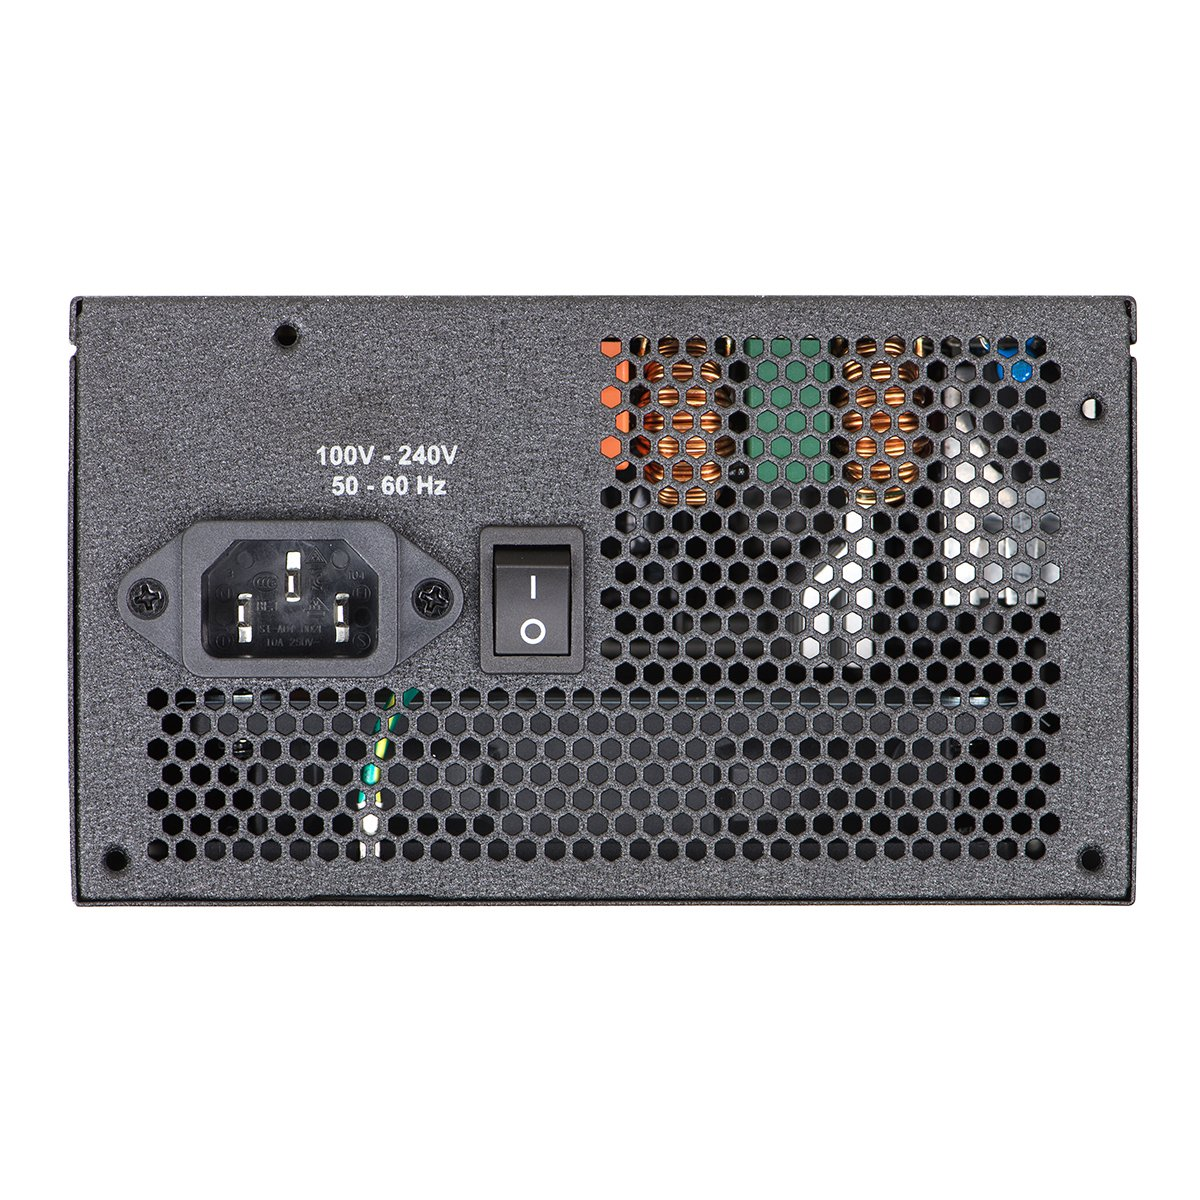 EVGA 600 BQ, 80+ Bronze 600W, Semi Modular, FDB Fan, 3 Year Warranty, Power Supply 110-BQ-0600-K1 by EVGA (Image #7)